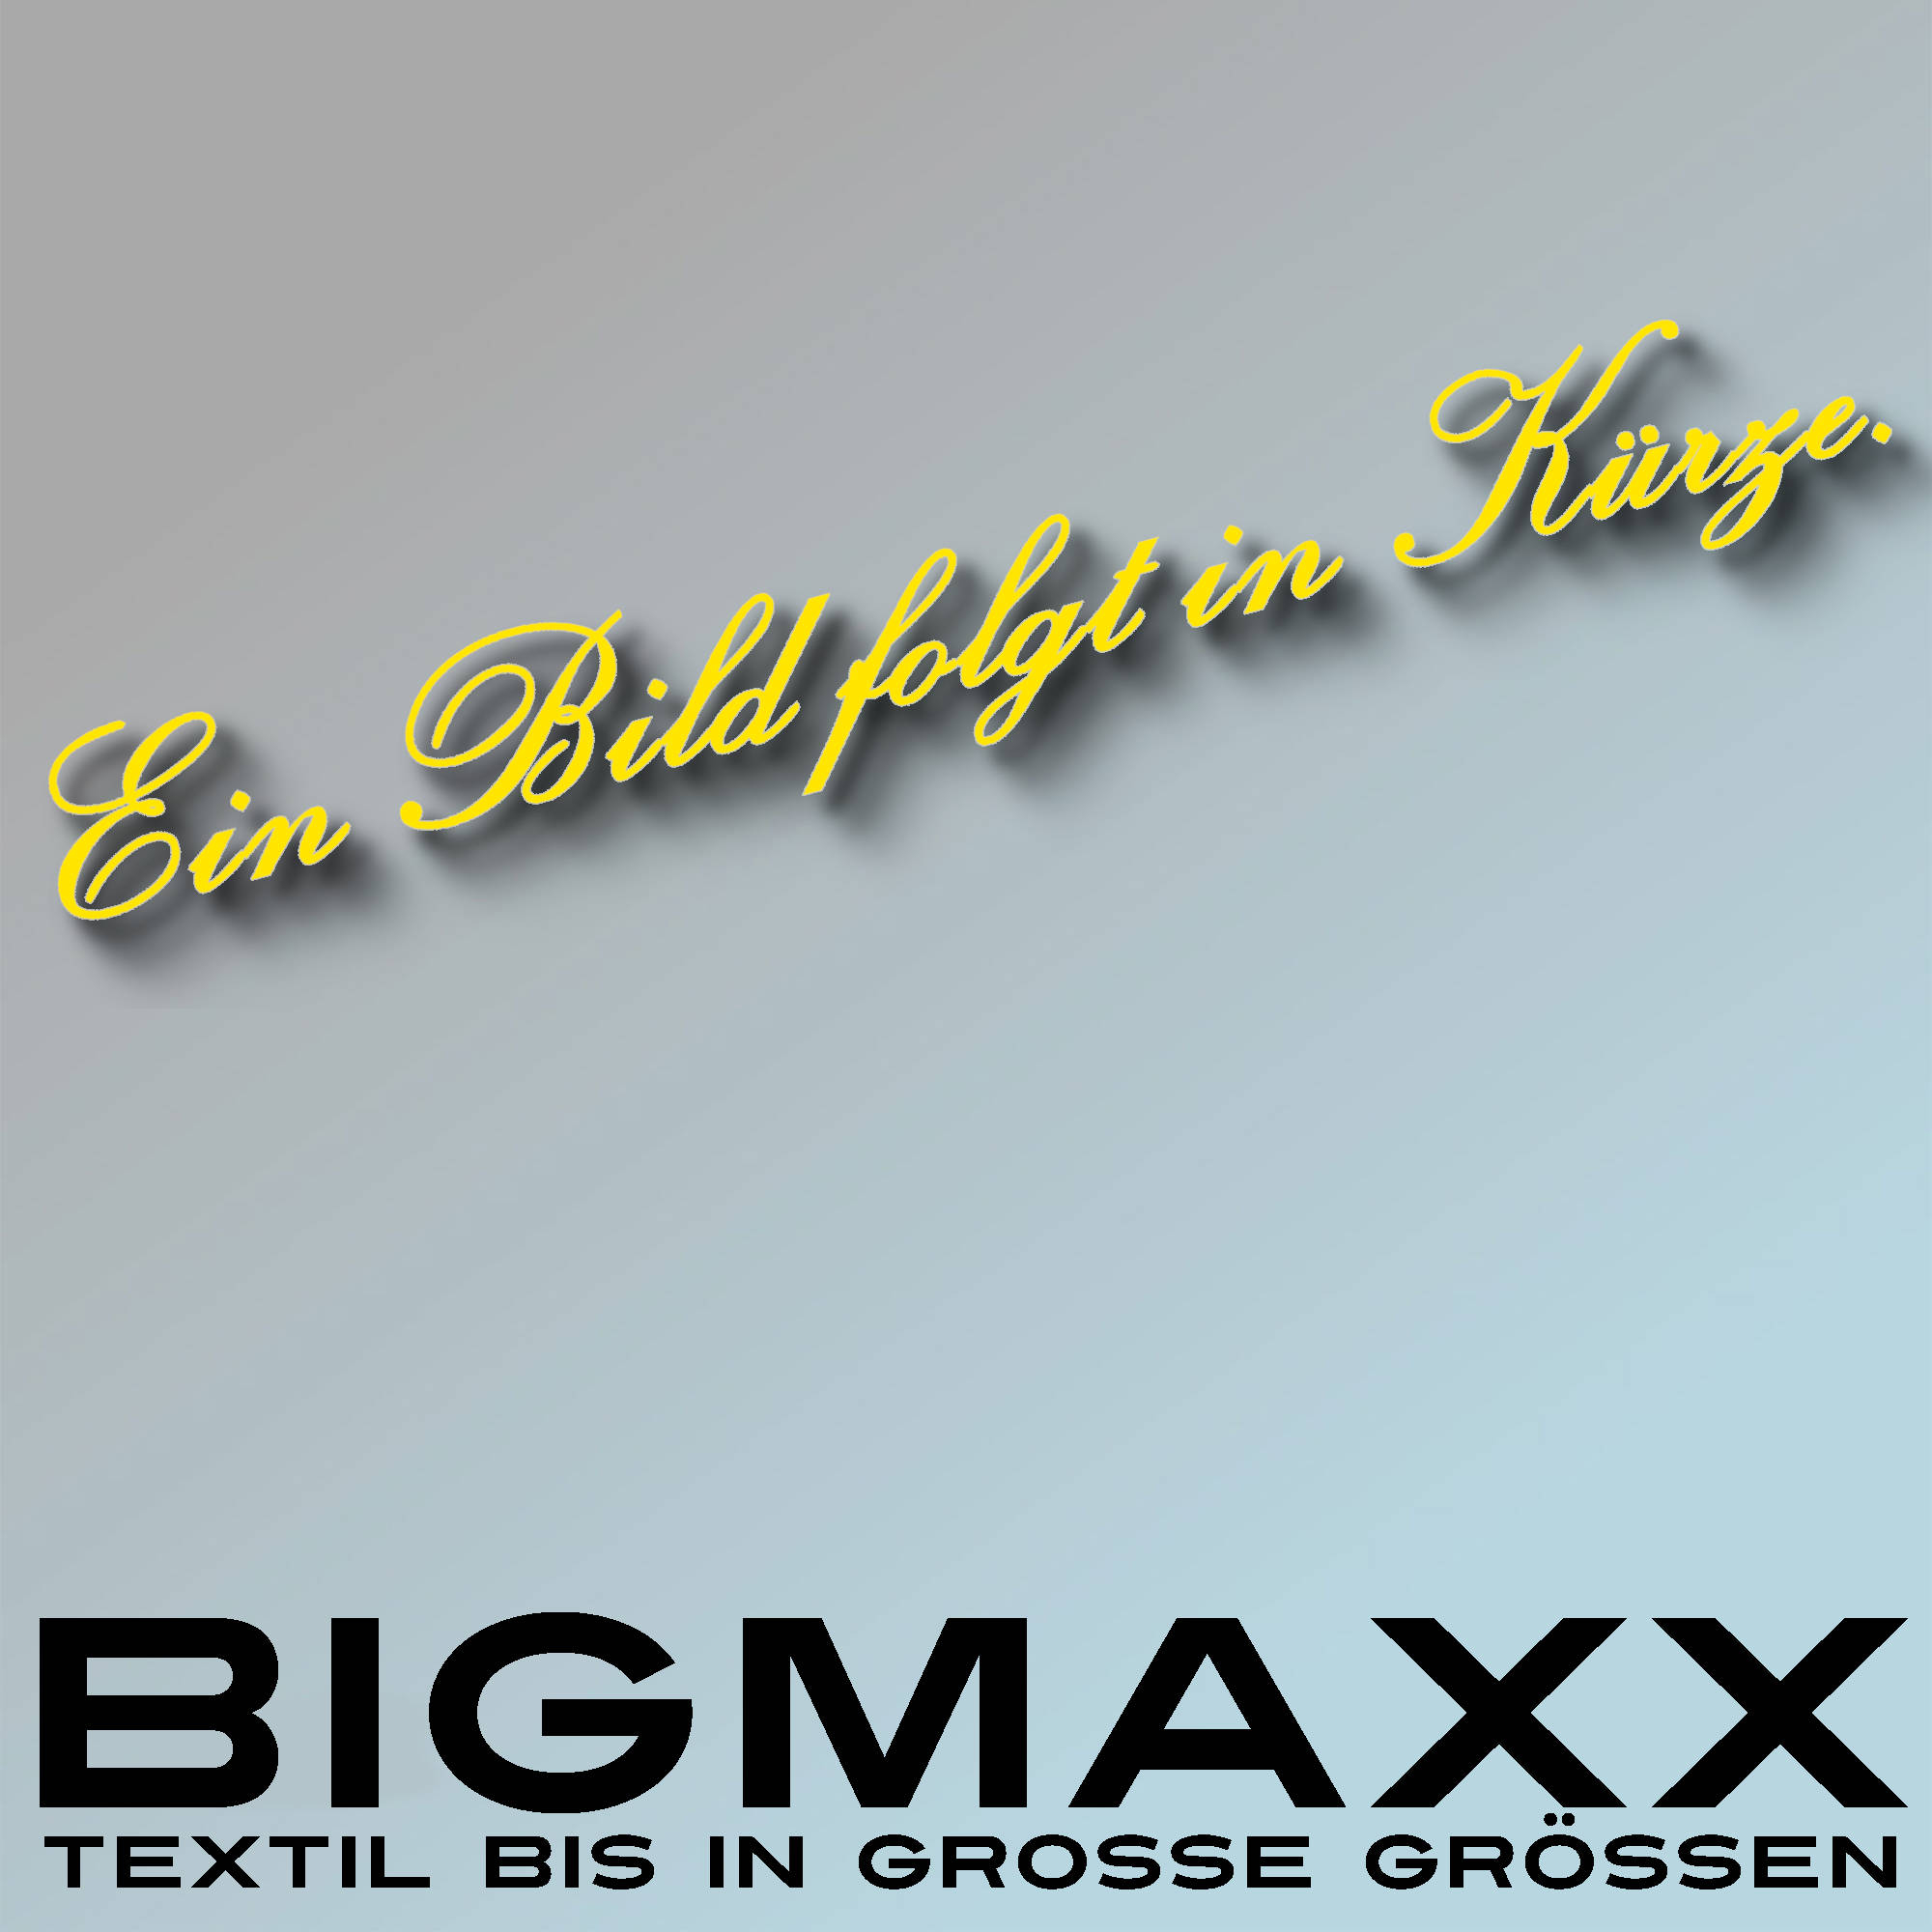 teXXor Warnweste Sicherheitswarnweste gem EN 471 orange leuchtorange